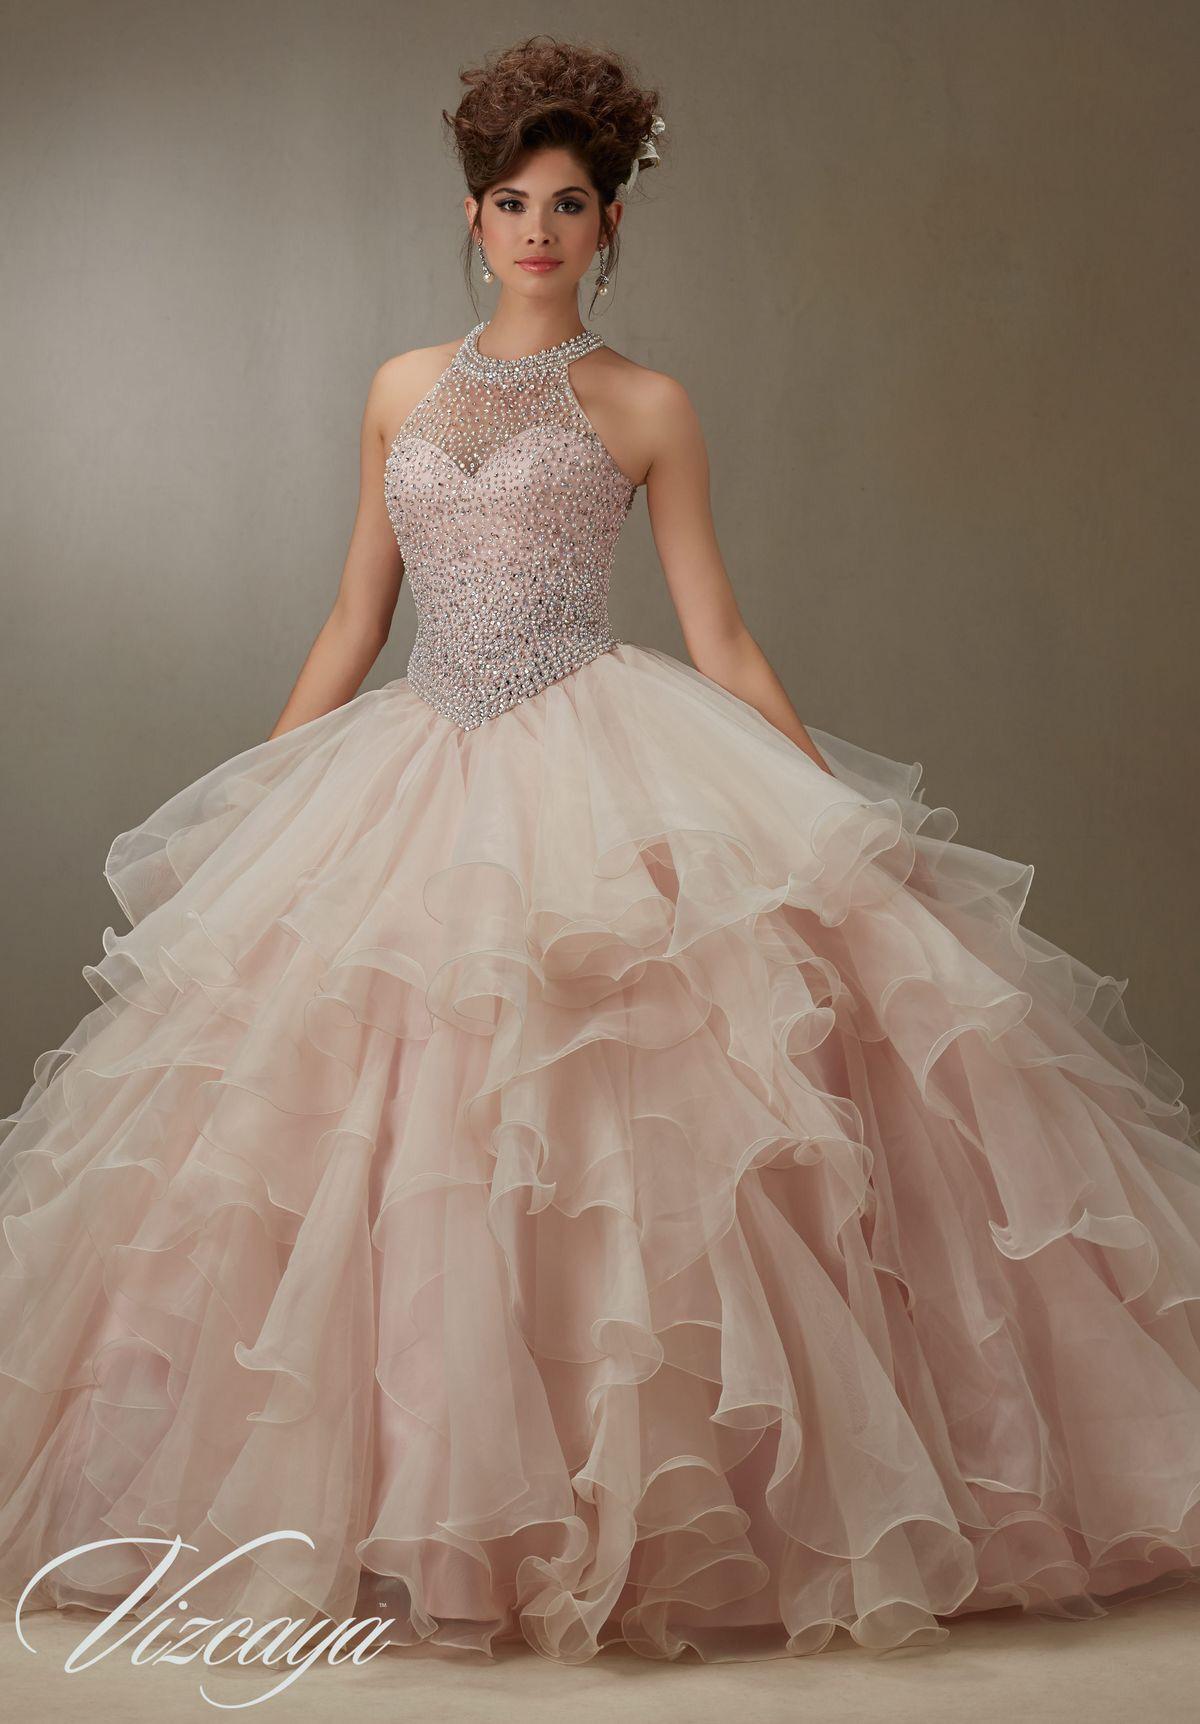 a74b382d333 Flounced Organza Skirt with Pearl Beaded Bodice Quinceañera Dress ...